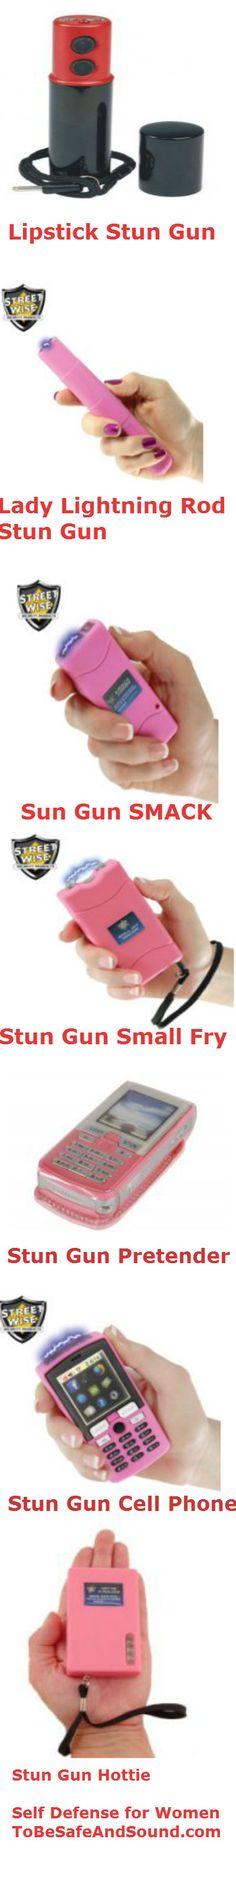 self defense weapons pdf free